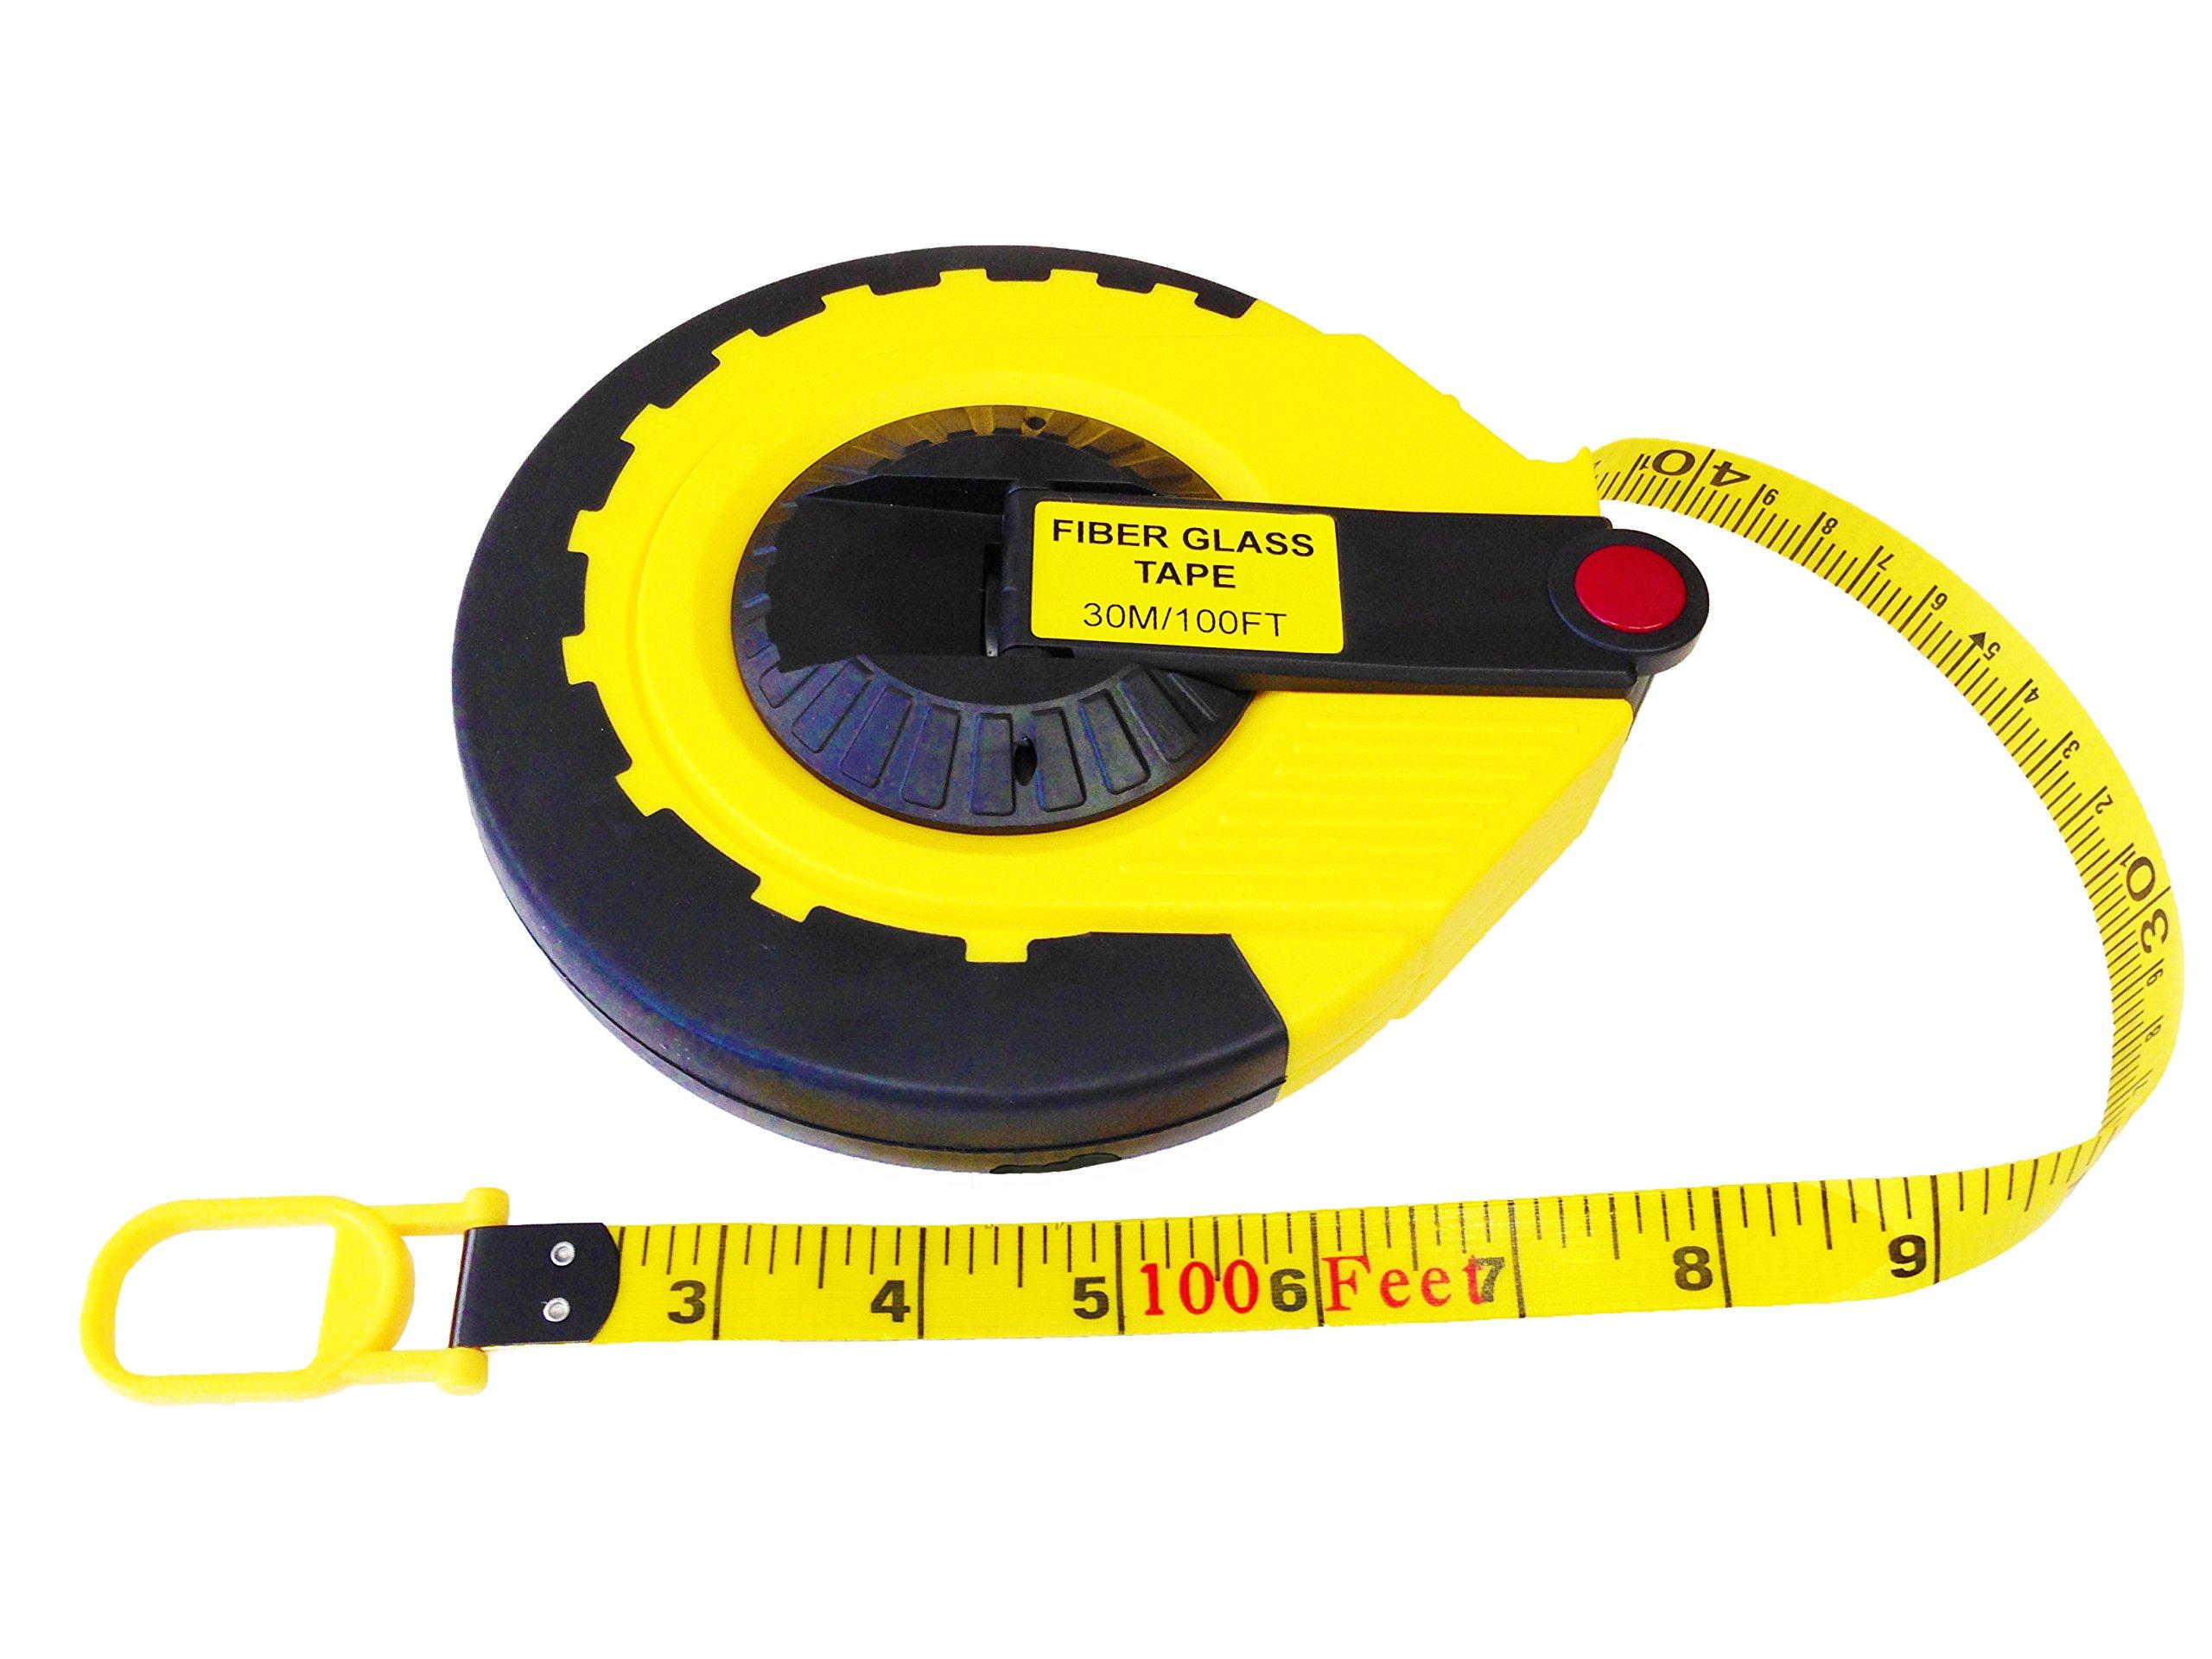 Perfect Surveyor's Tape Measure - 100 ft. / 30m